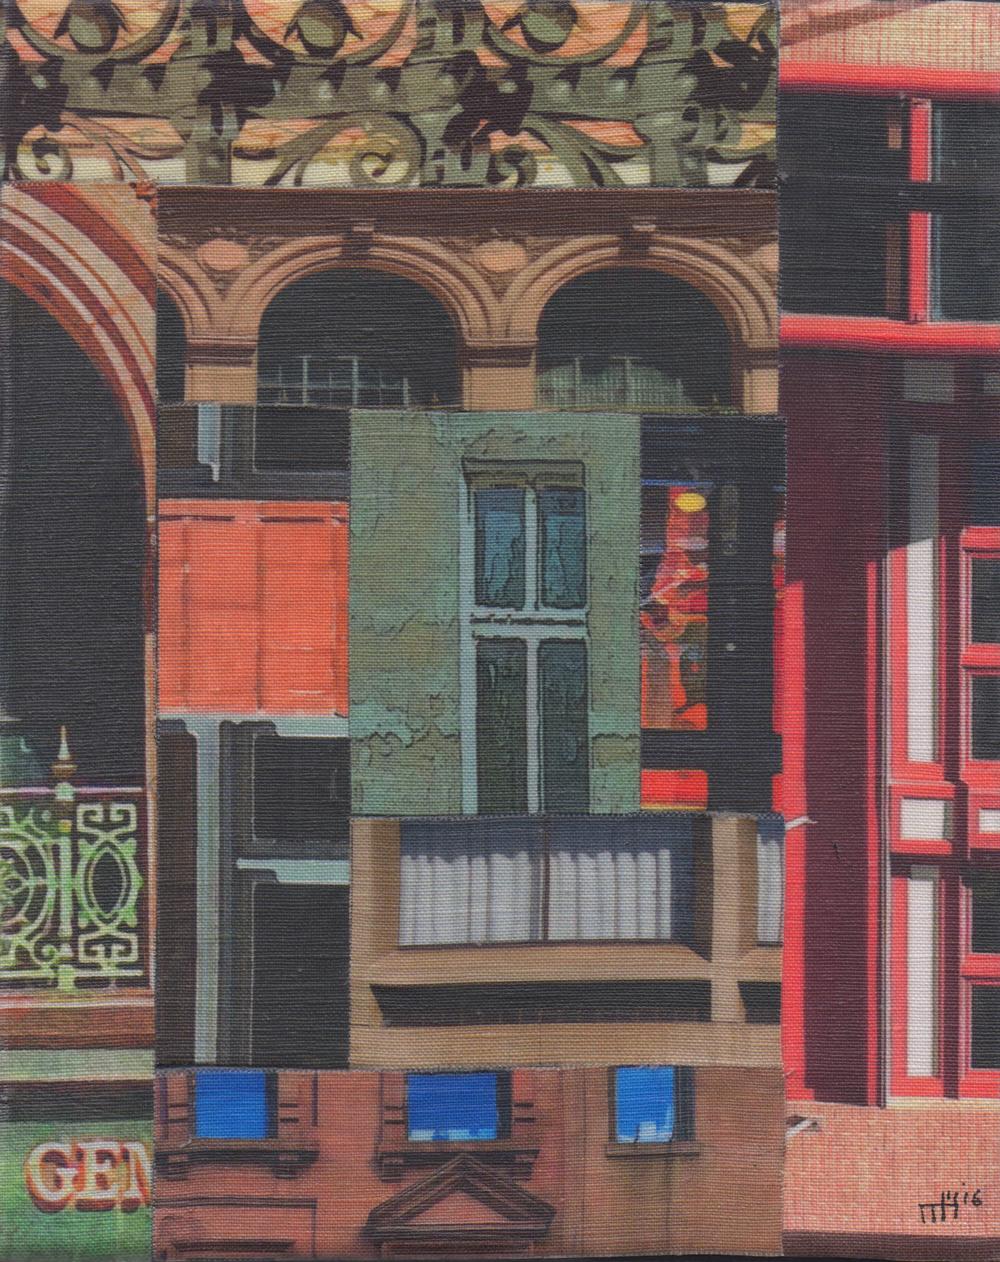 patchwork city 32